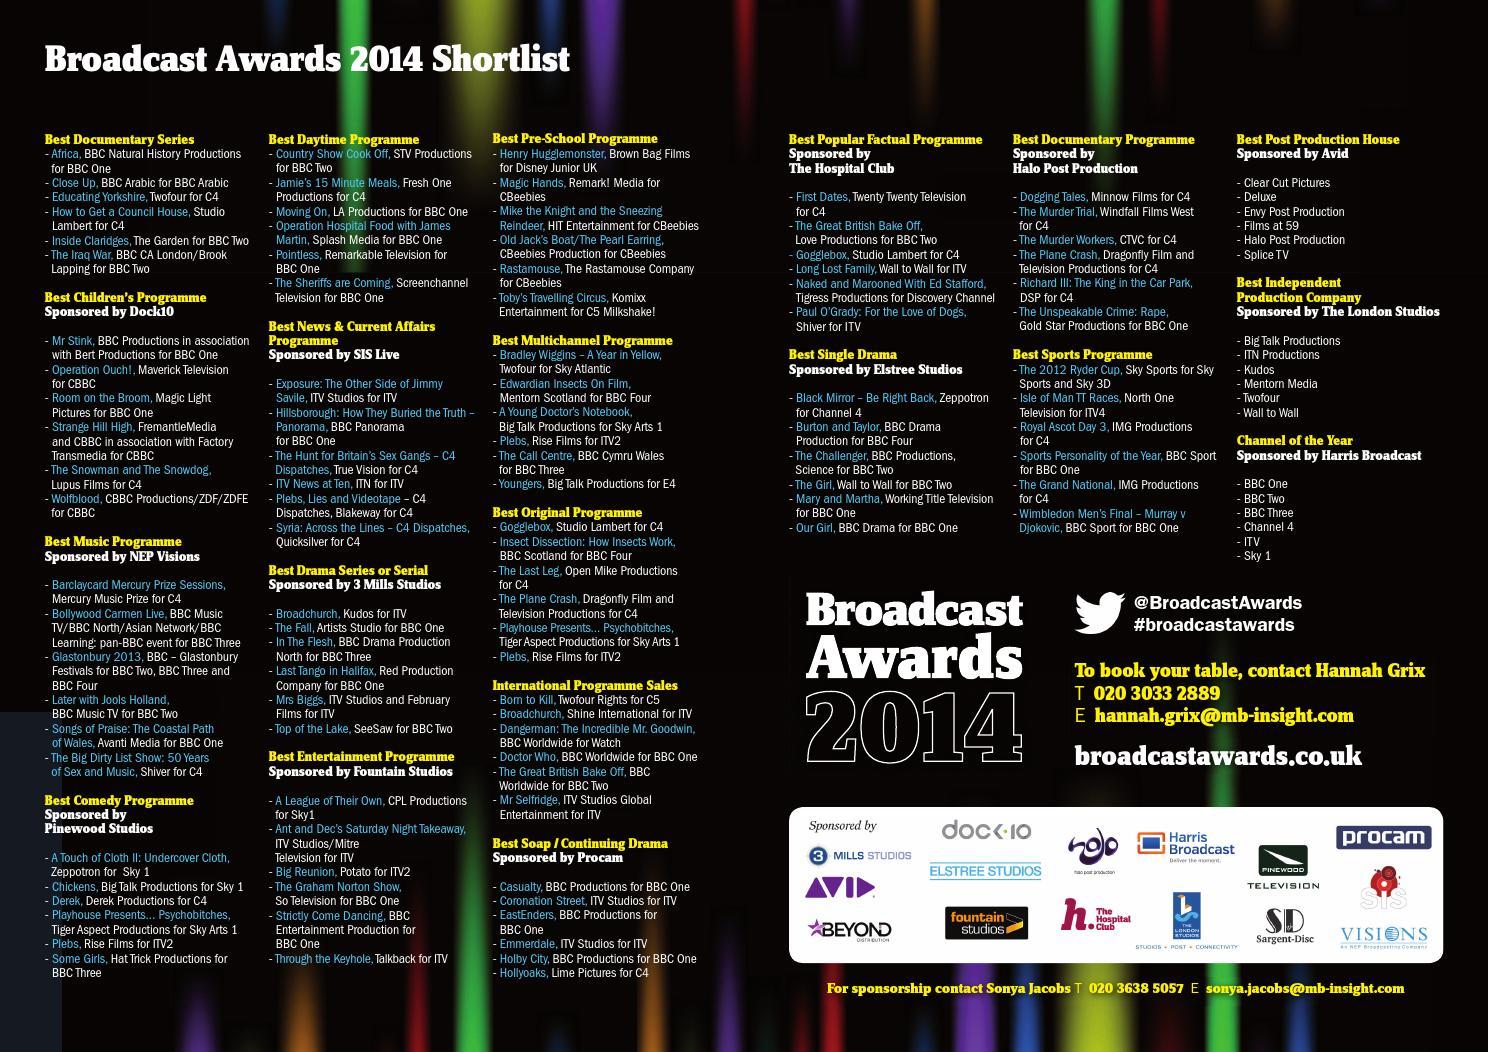 Bc awards shortlist dps by Media Business Insight - issuu